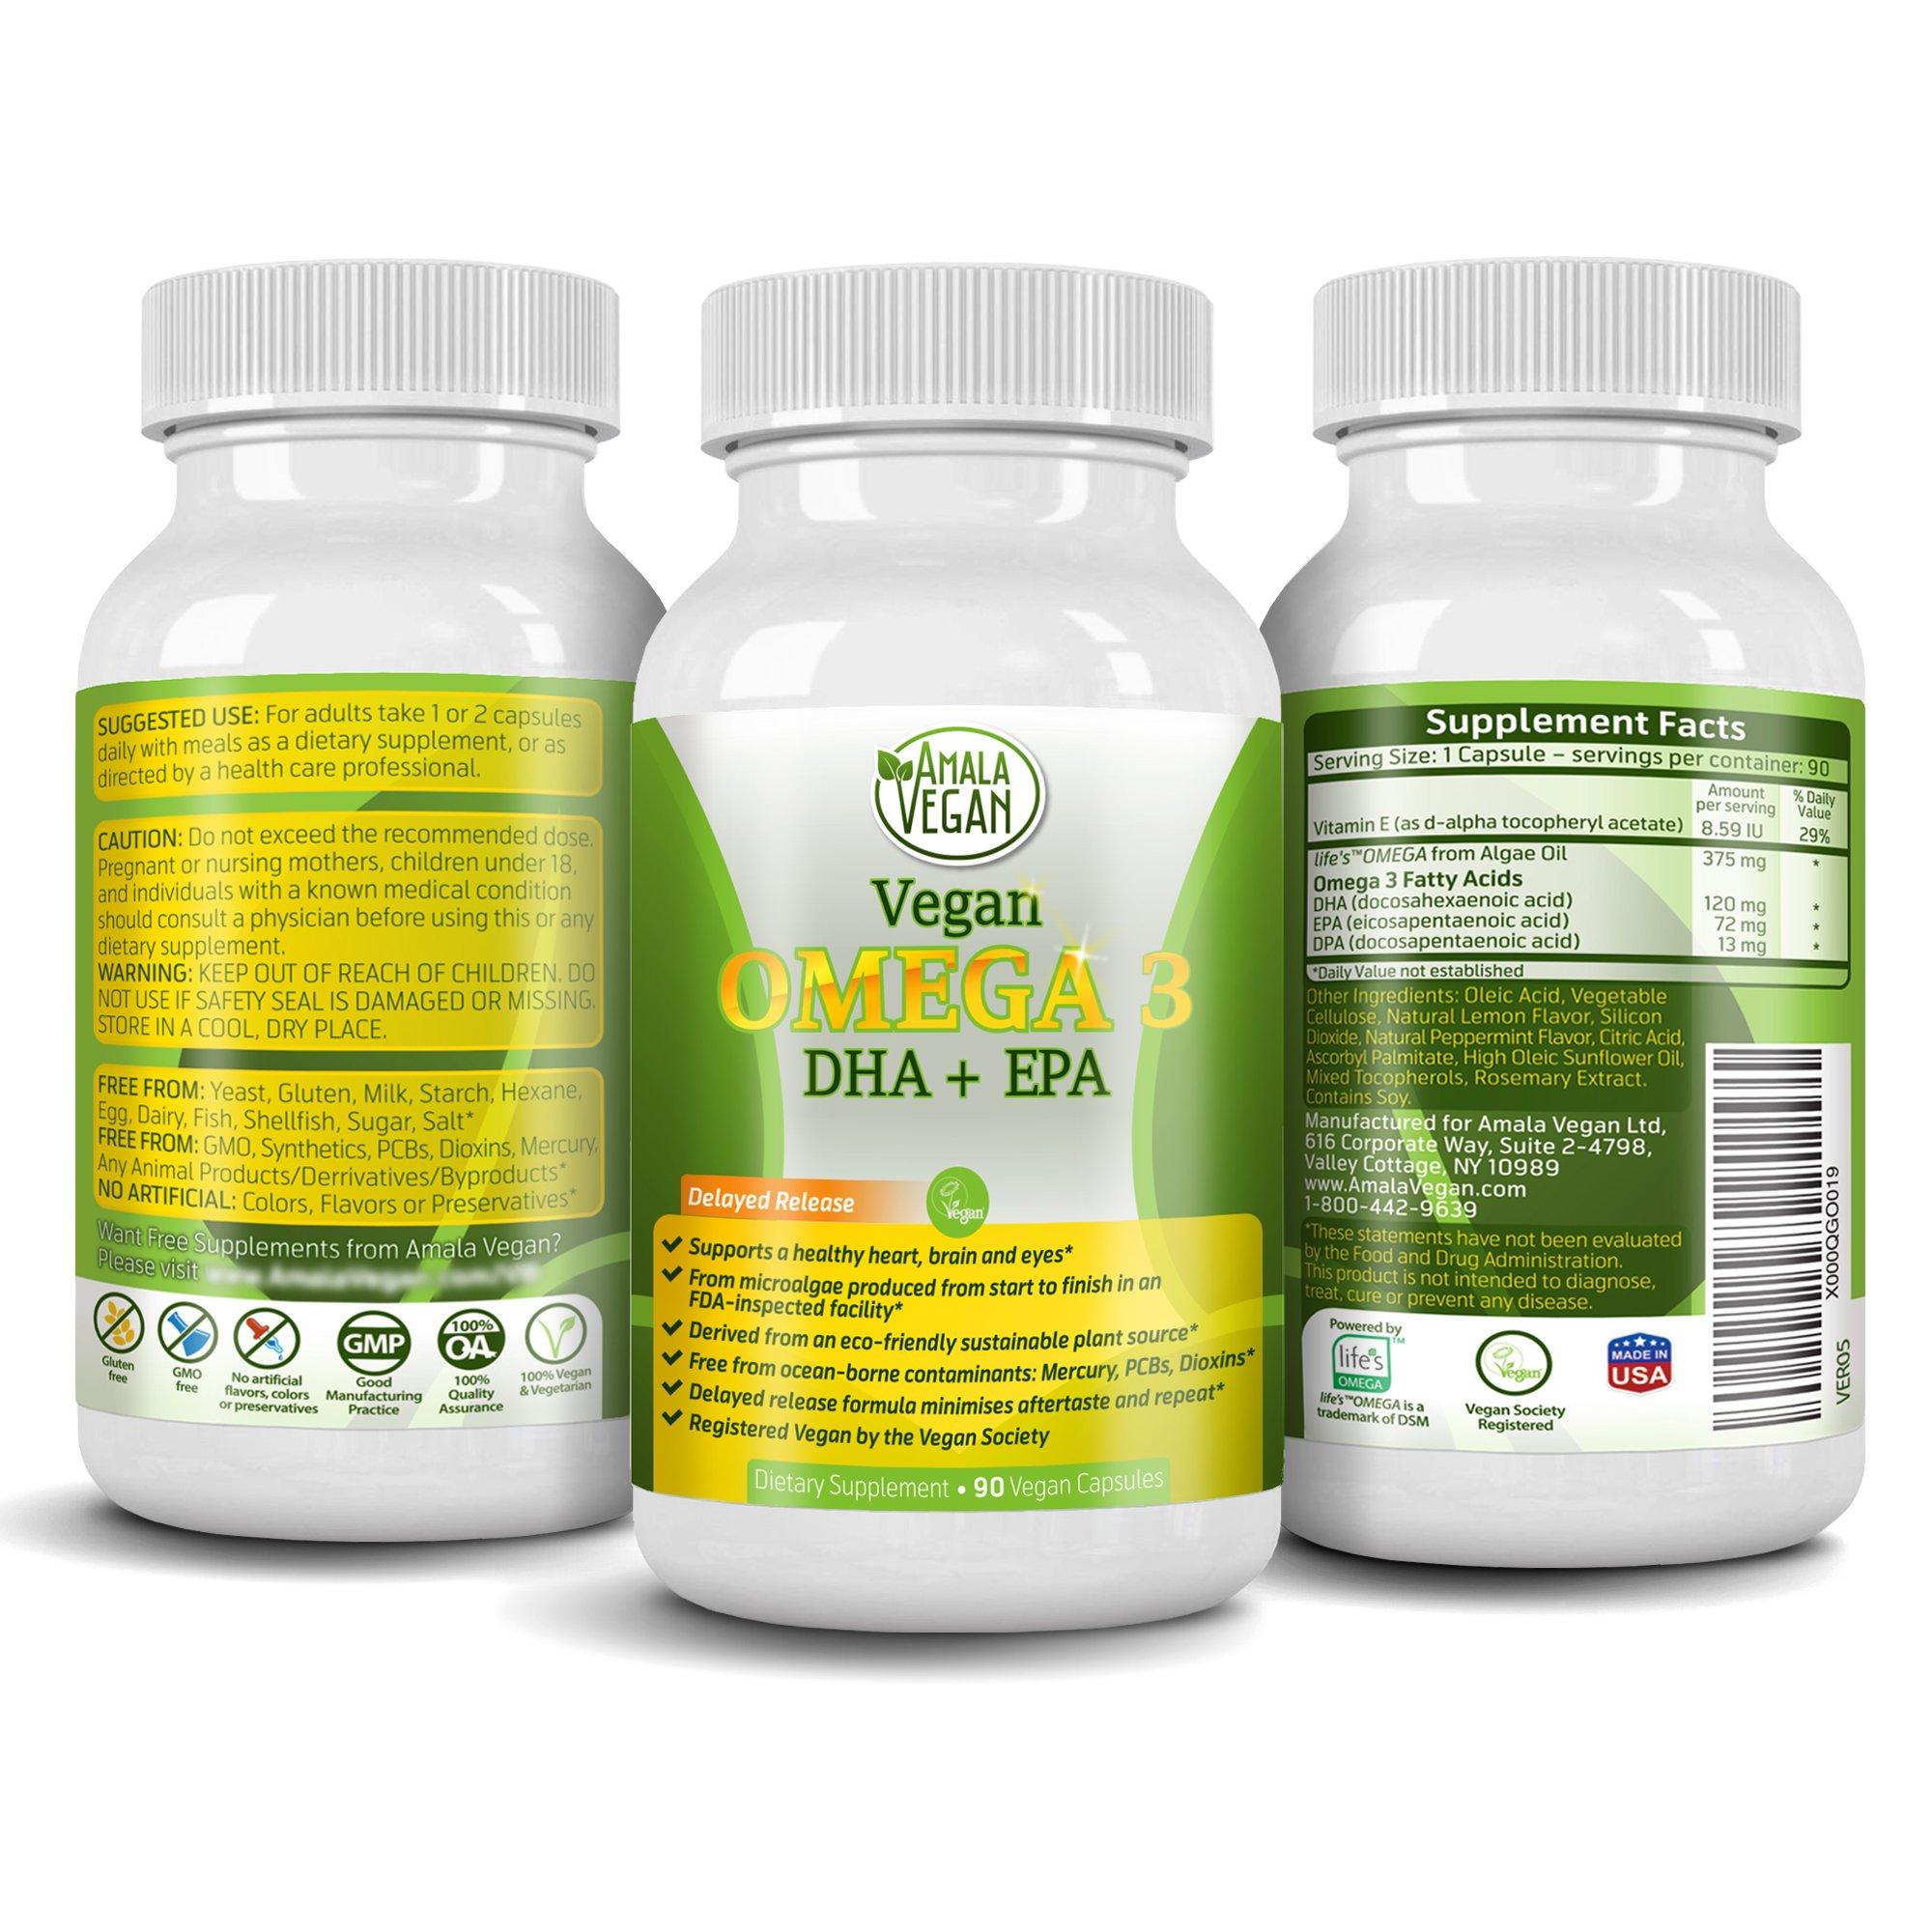 Potent Vegan Omega 3 Supplement w/Essential Fatty Acids, Vitamin E, DHA & EPA - Vegetarian Algae based & Non GMO Time-Release Capsules - Improve Eye, Heart, Brain Health - Better than Fish Oil